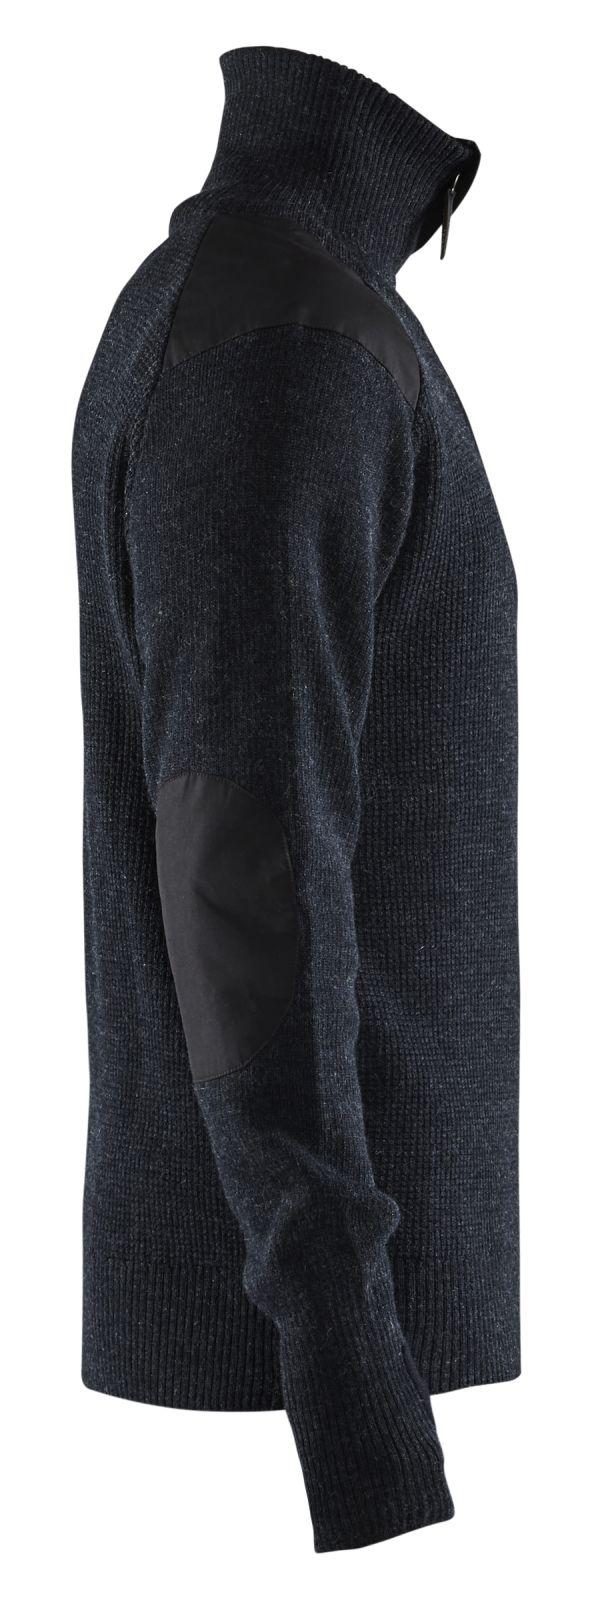 Blaklader Truien 46301071 donkergrijs-zwart(9899)